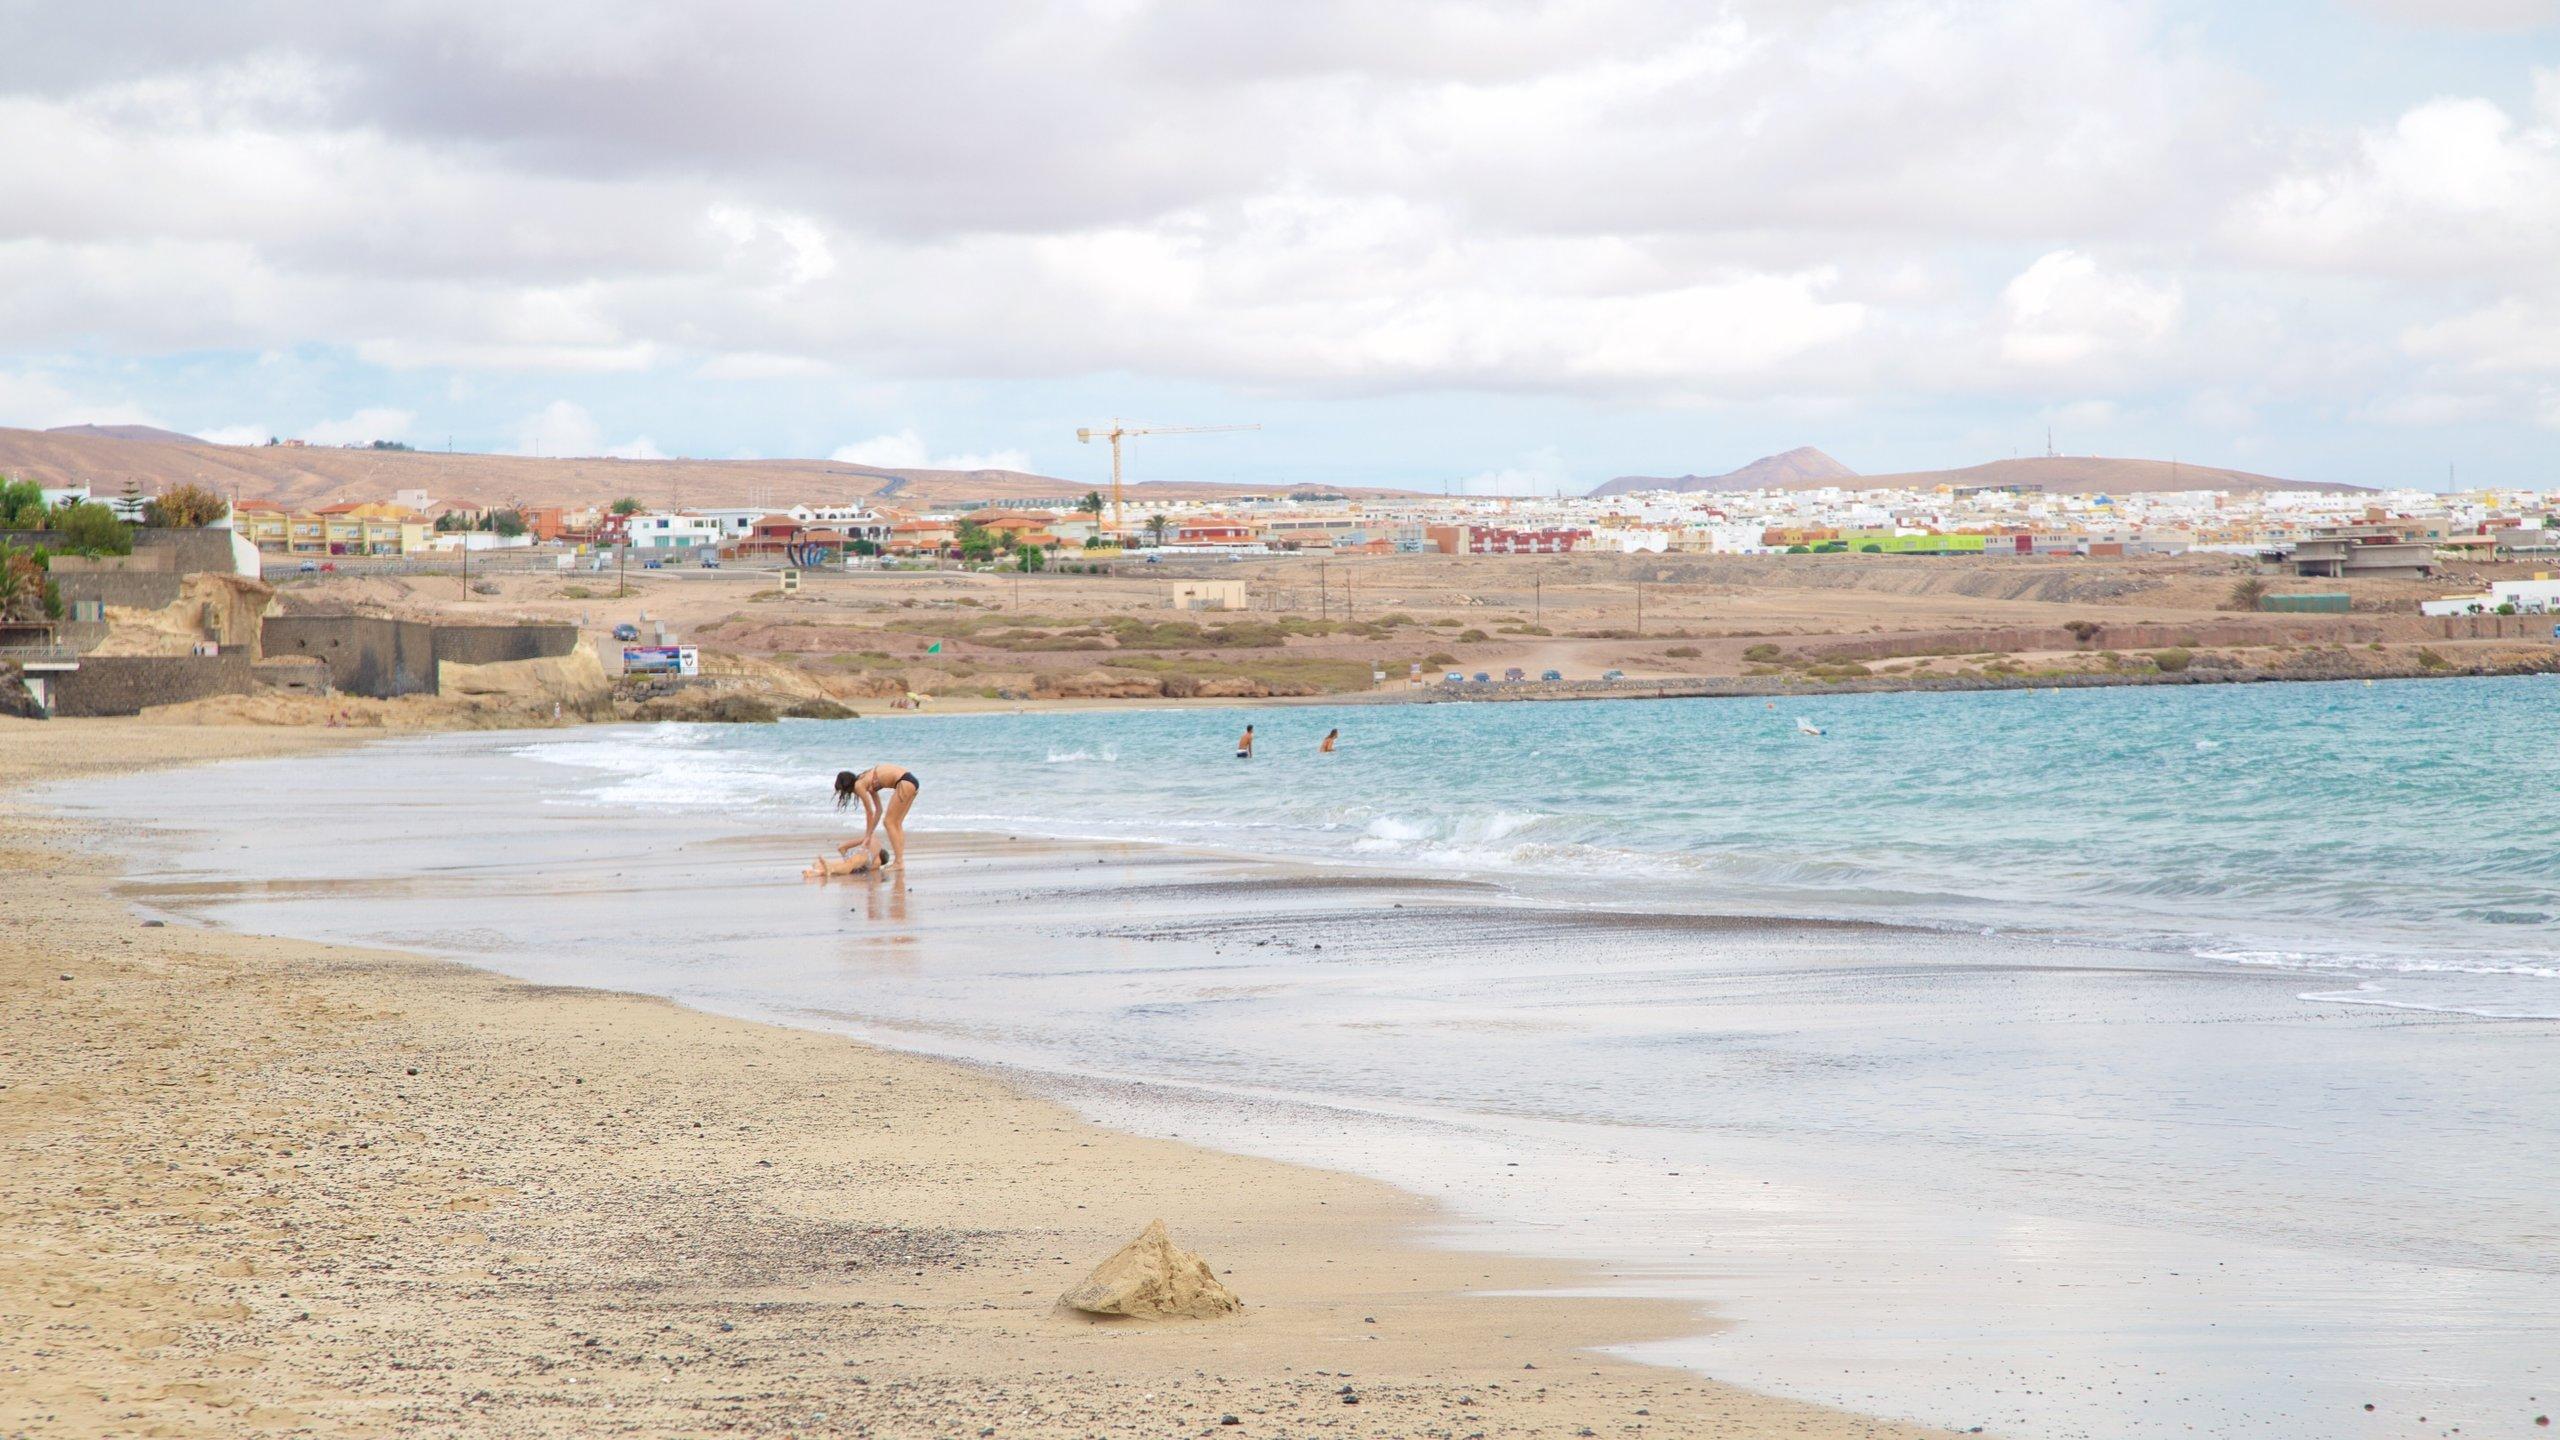 Redondo spiaggia dating